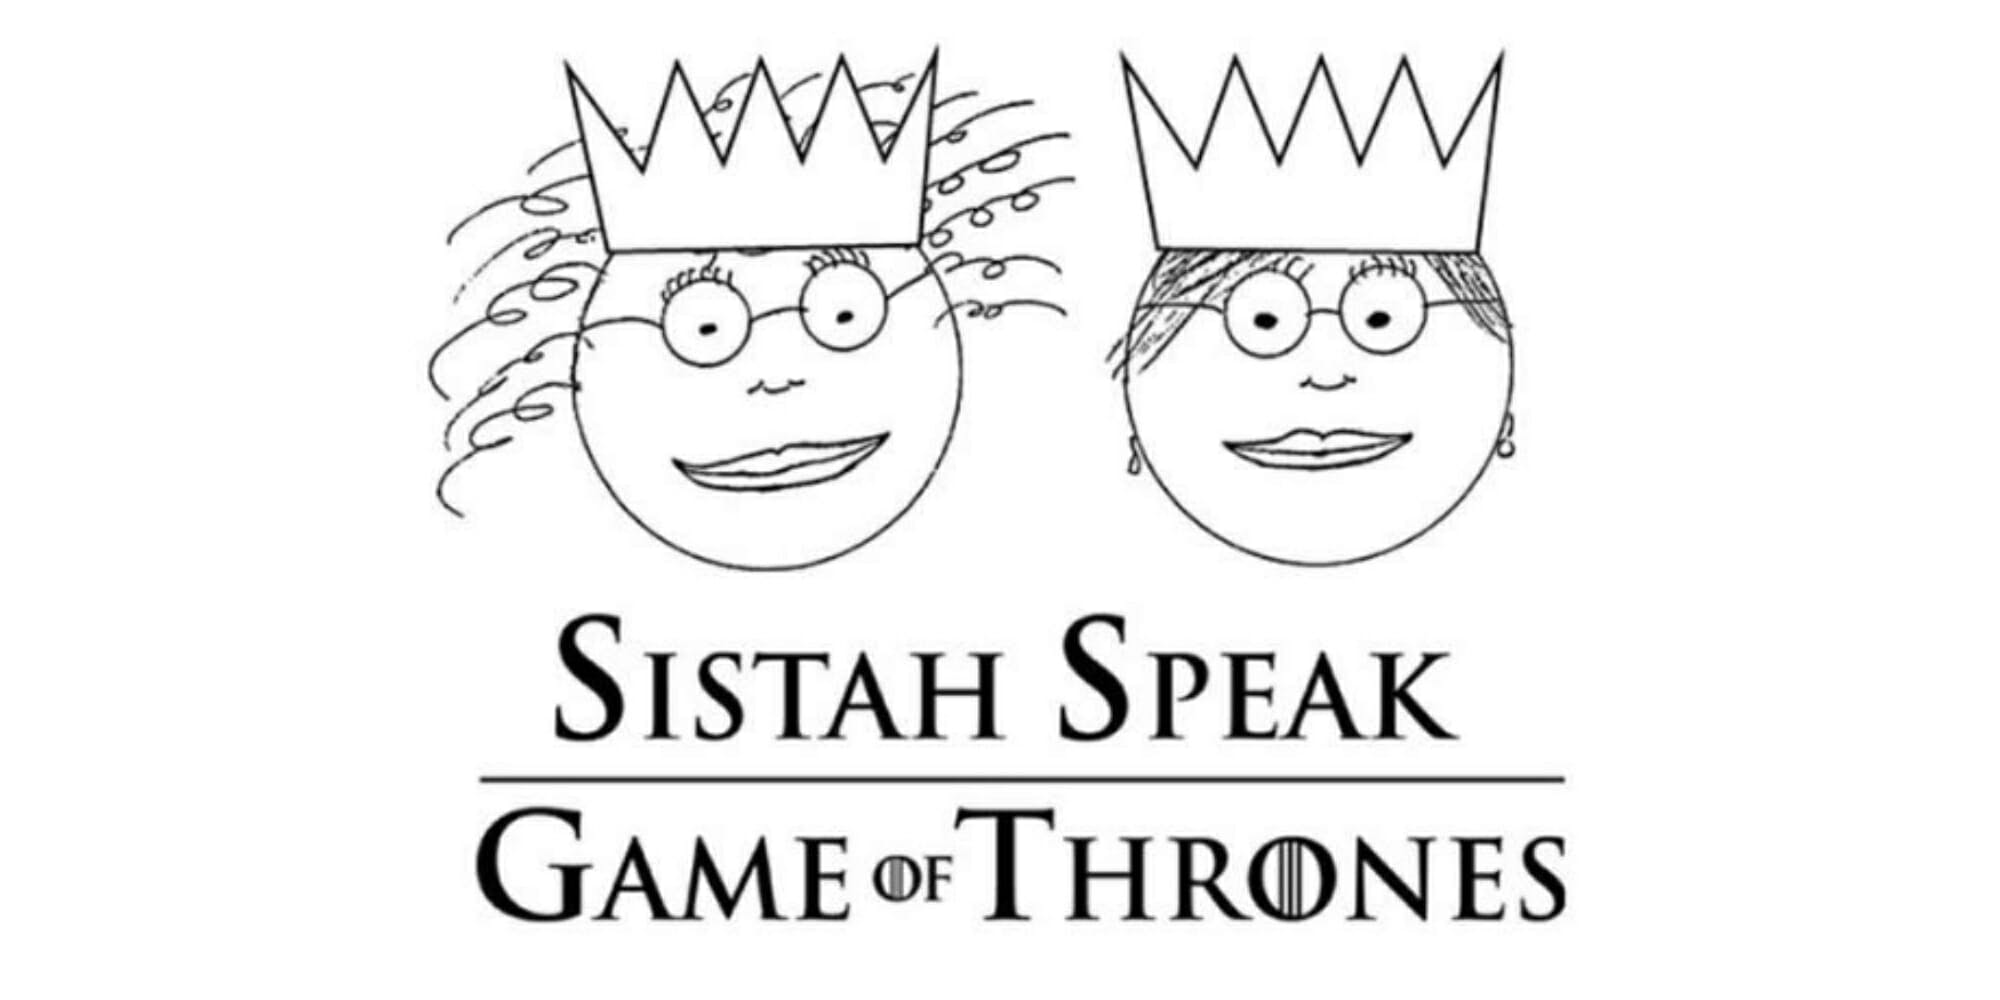 best game of thrones podcasts - sistah speak